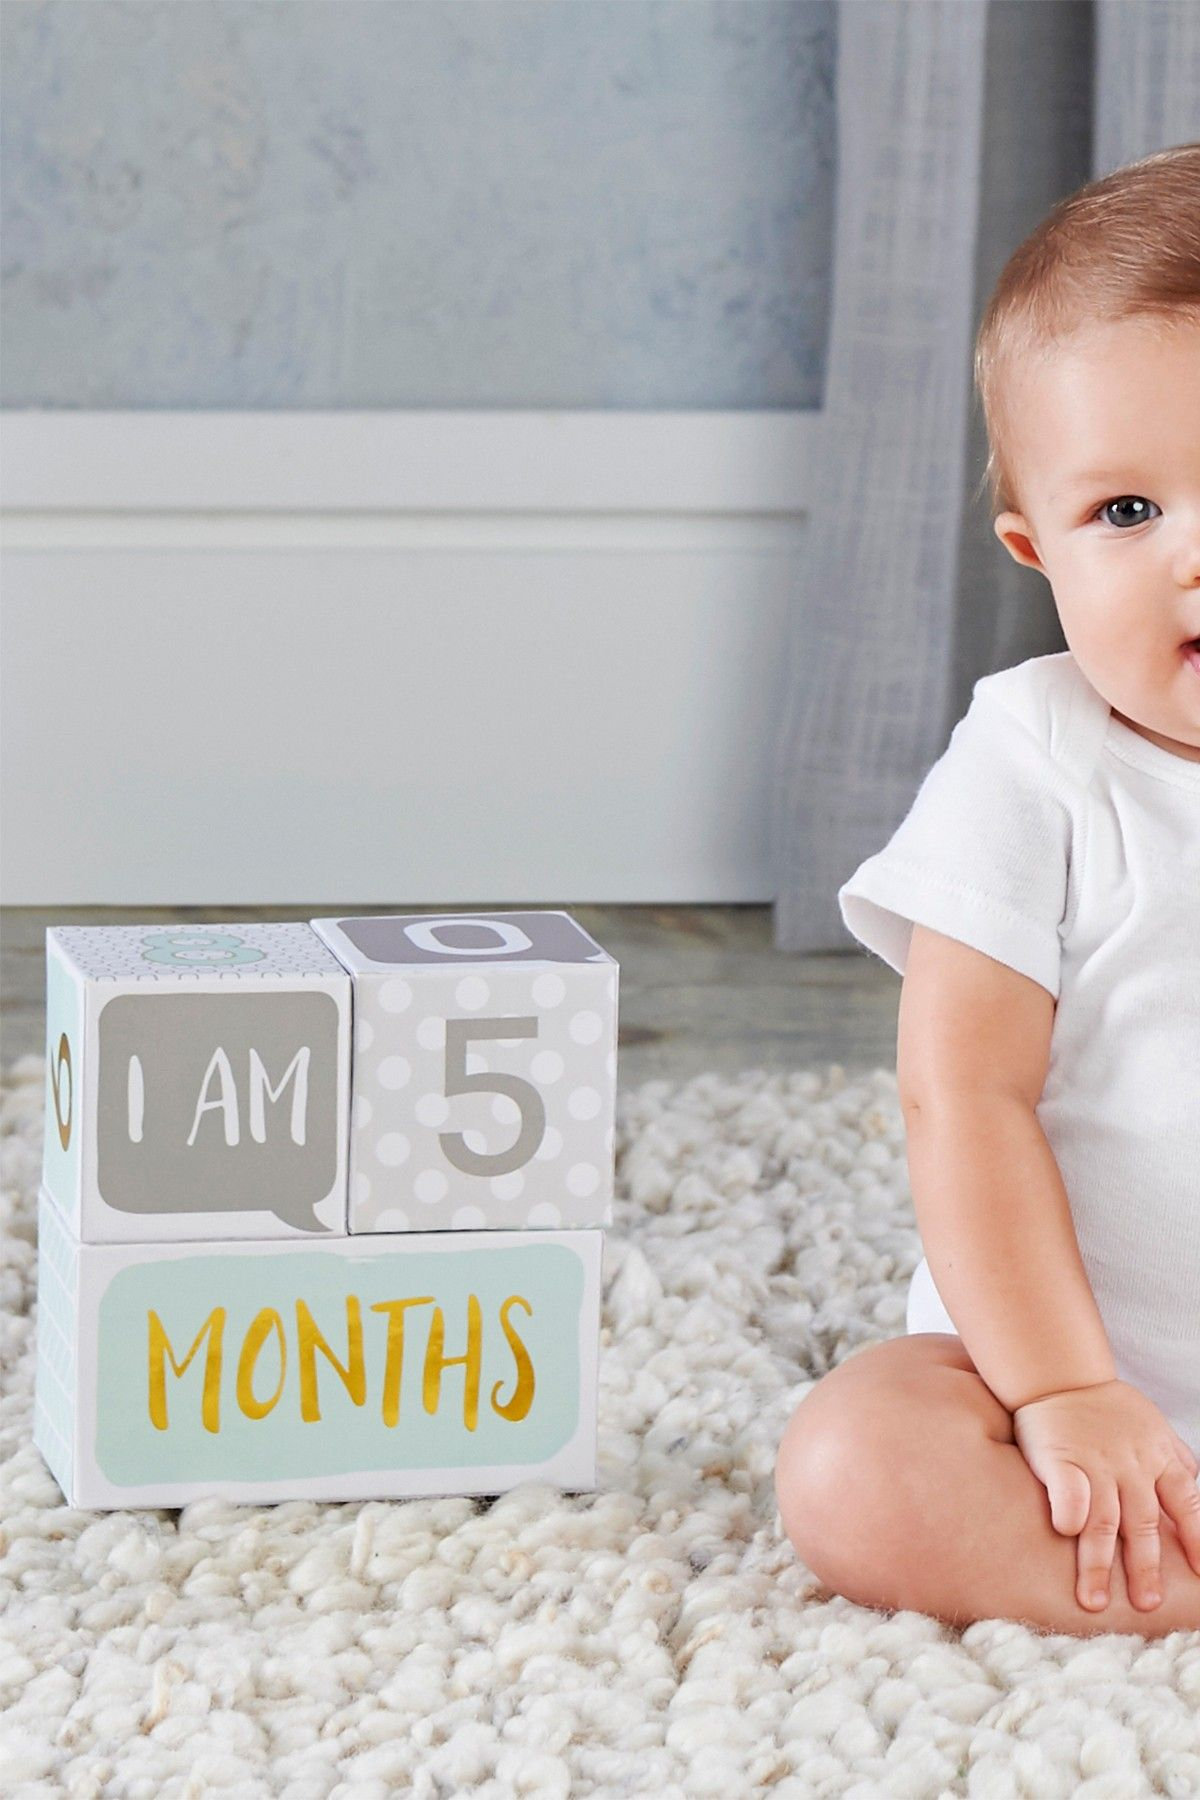 Baby Aspen My First Milestone Baby Age Blocks Kids Fashion Girl Baby Age Blocks Kids Fashion